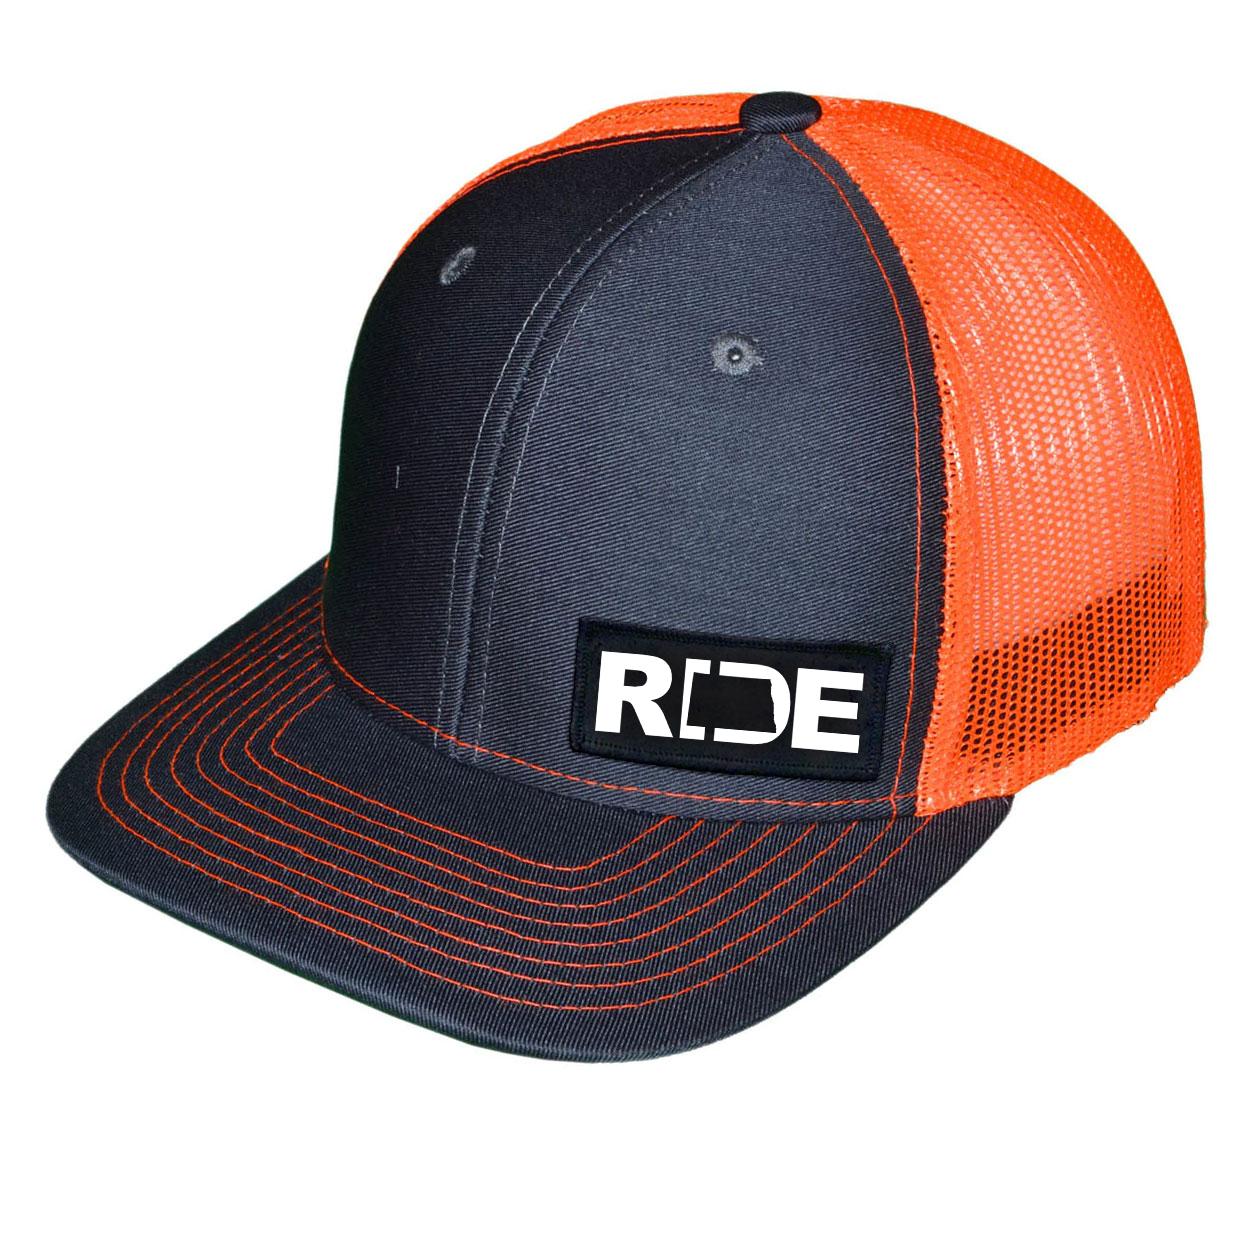 Ride North Dakota Night Out Woven Patch Snapback Trucker Hat Dark Gray/Orange (White Logo)